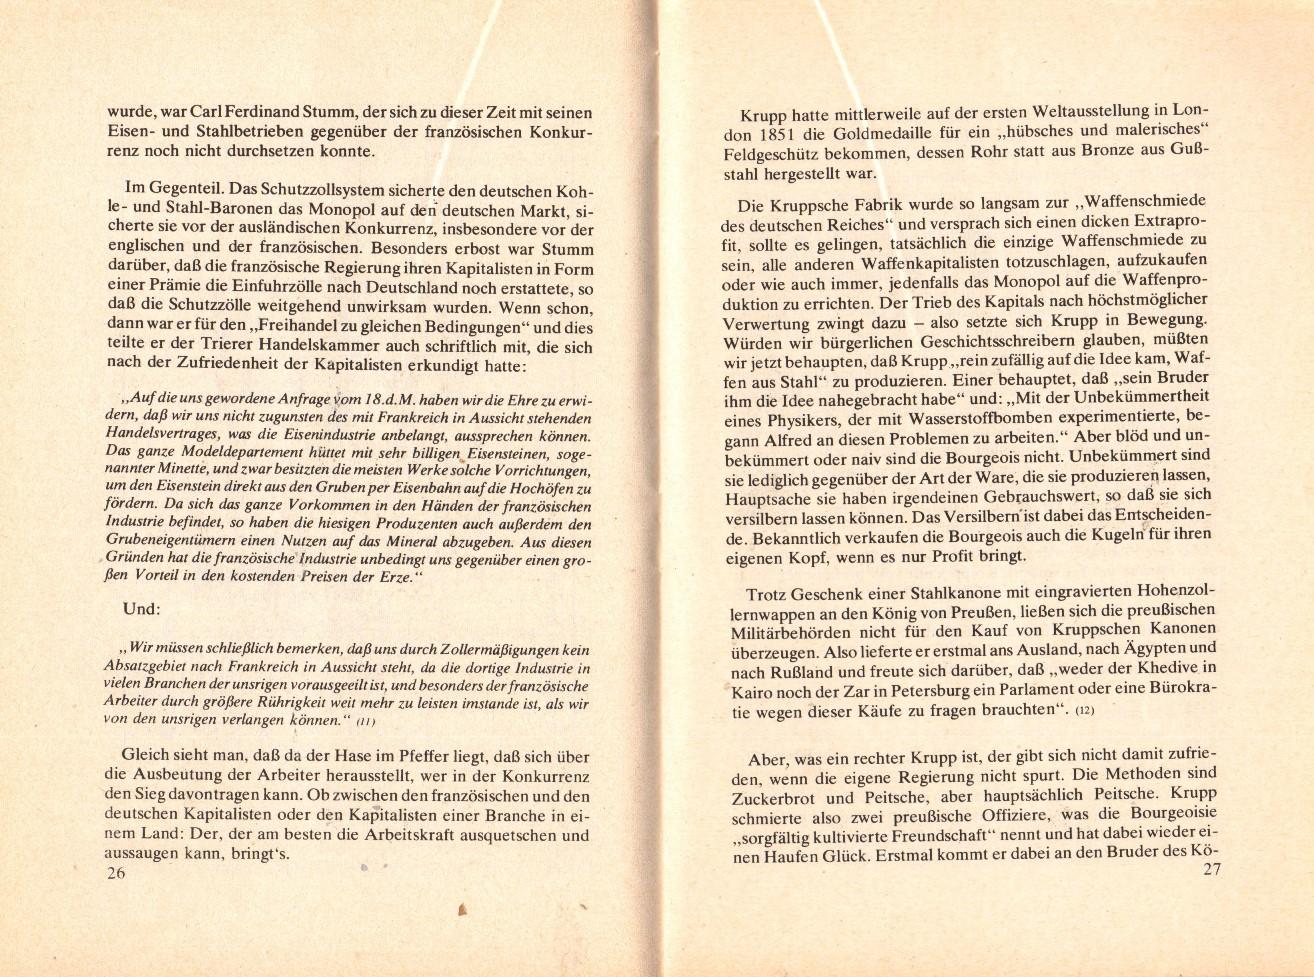 NRW_KBW_1977_Politik_der_Kohle_u_Stahlbarone_14